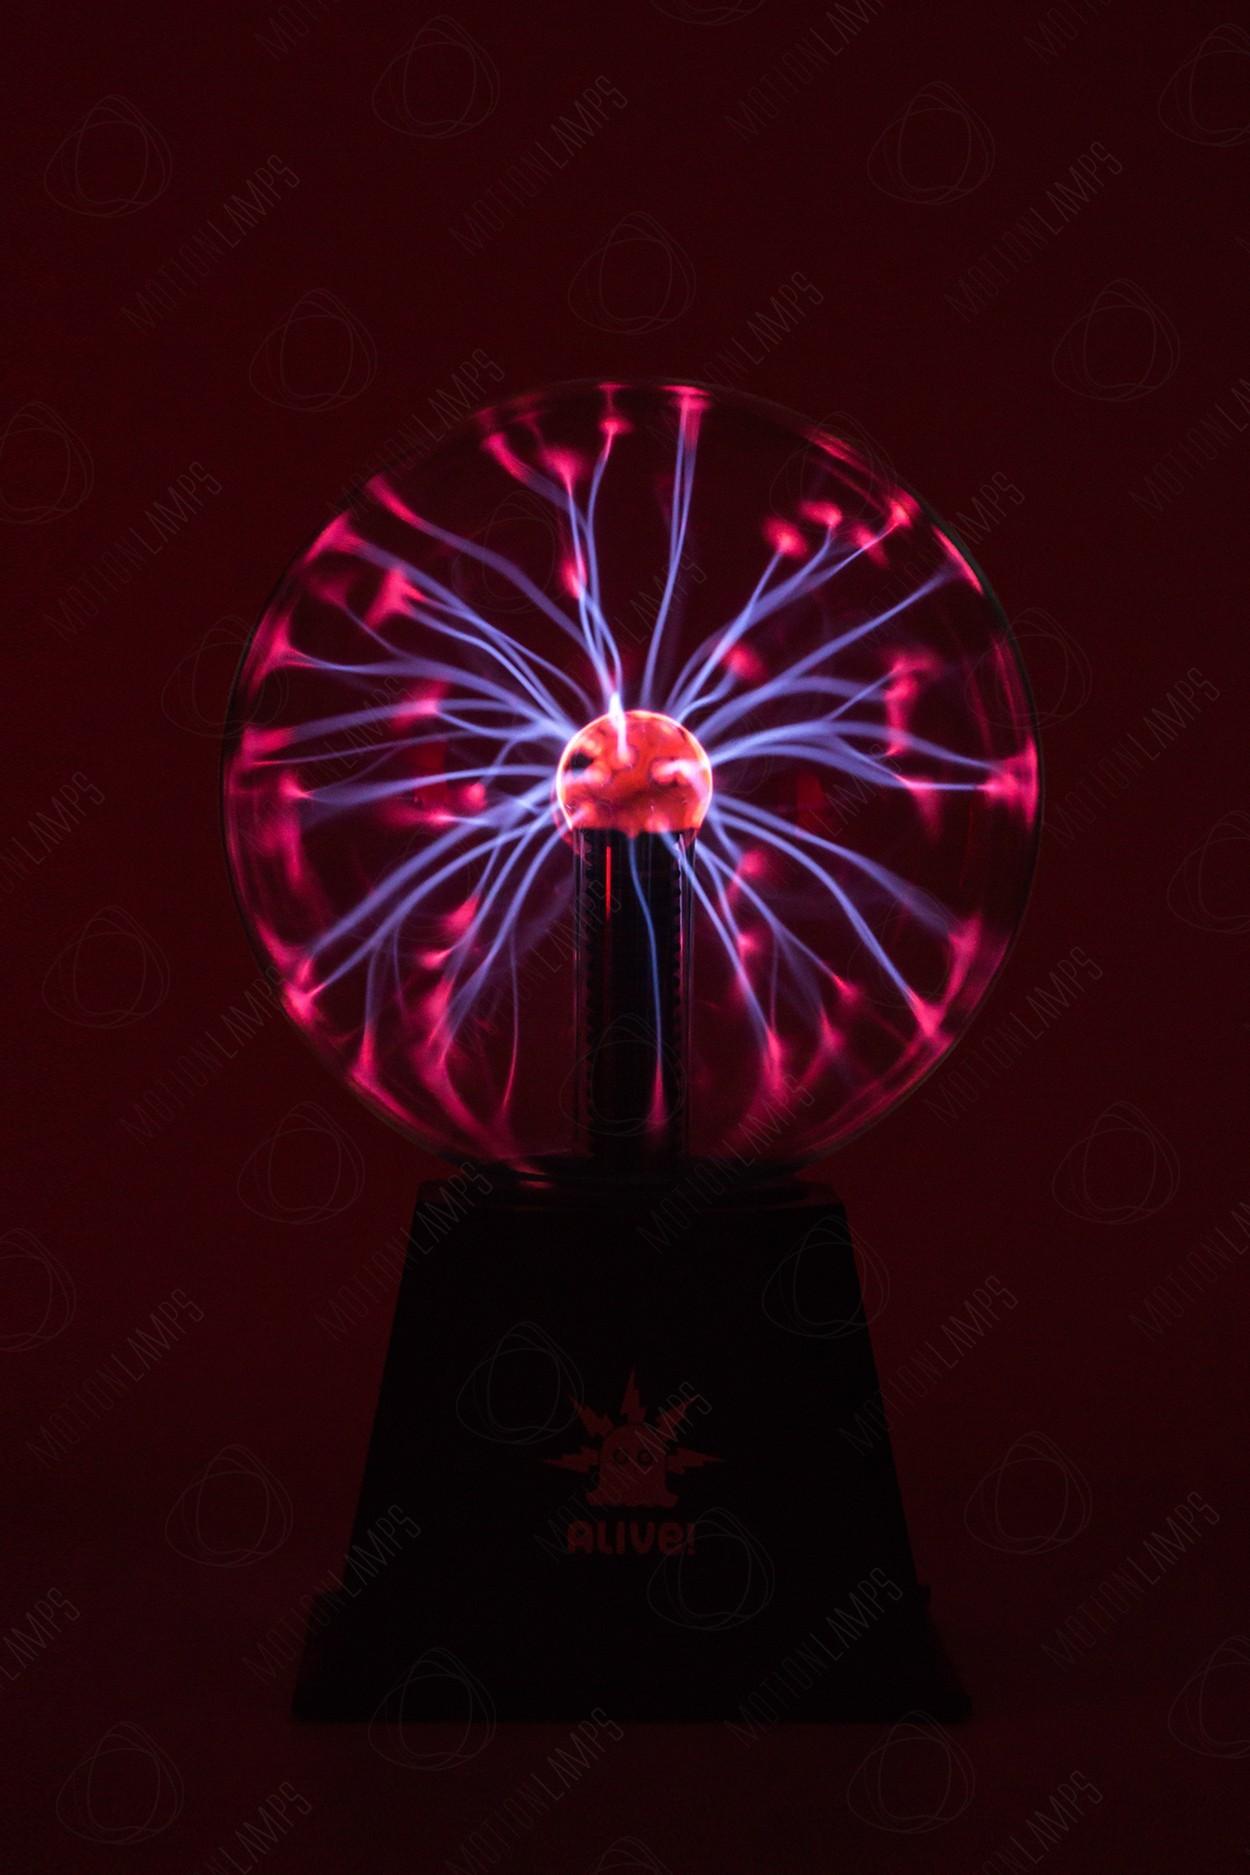 Плазменный шар Alive Plasma